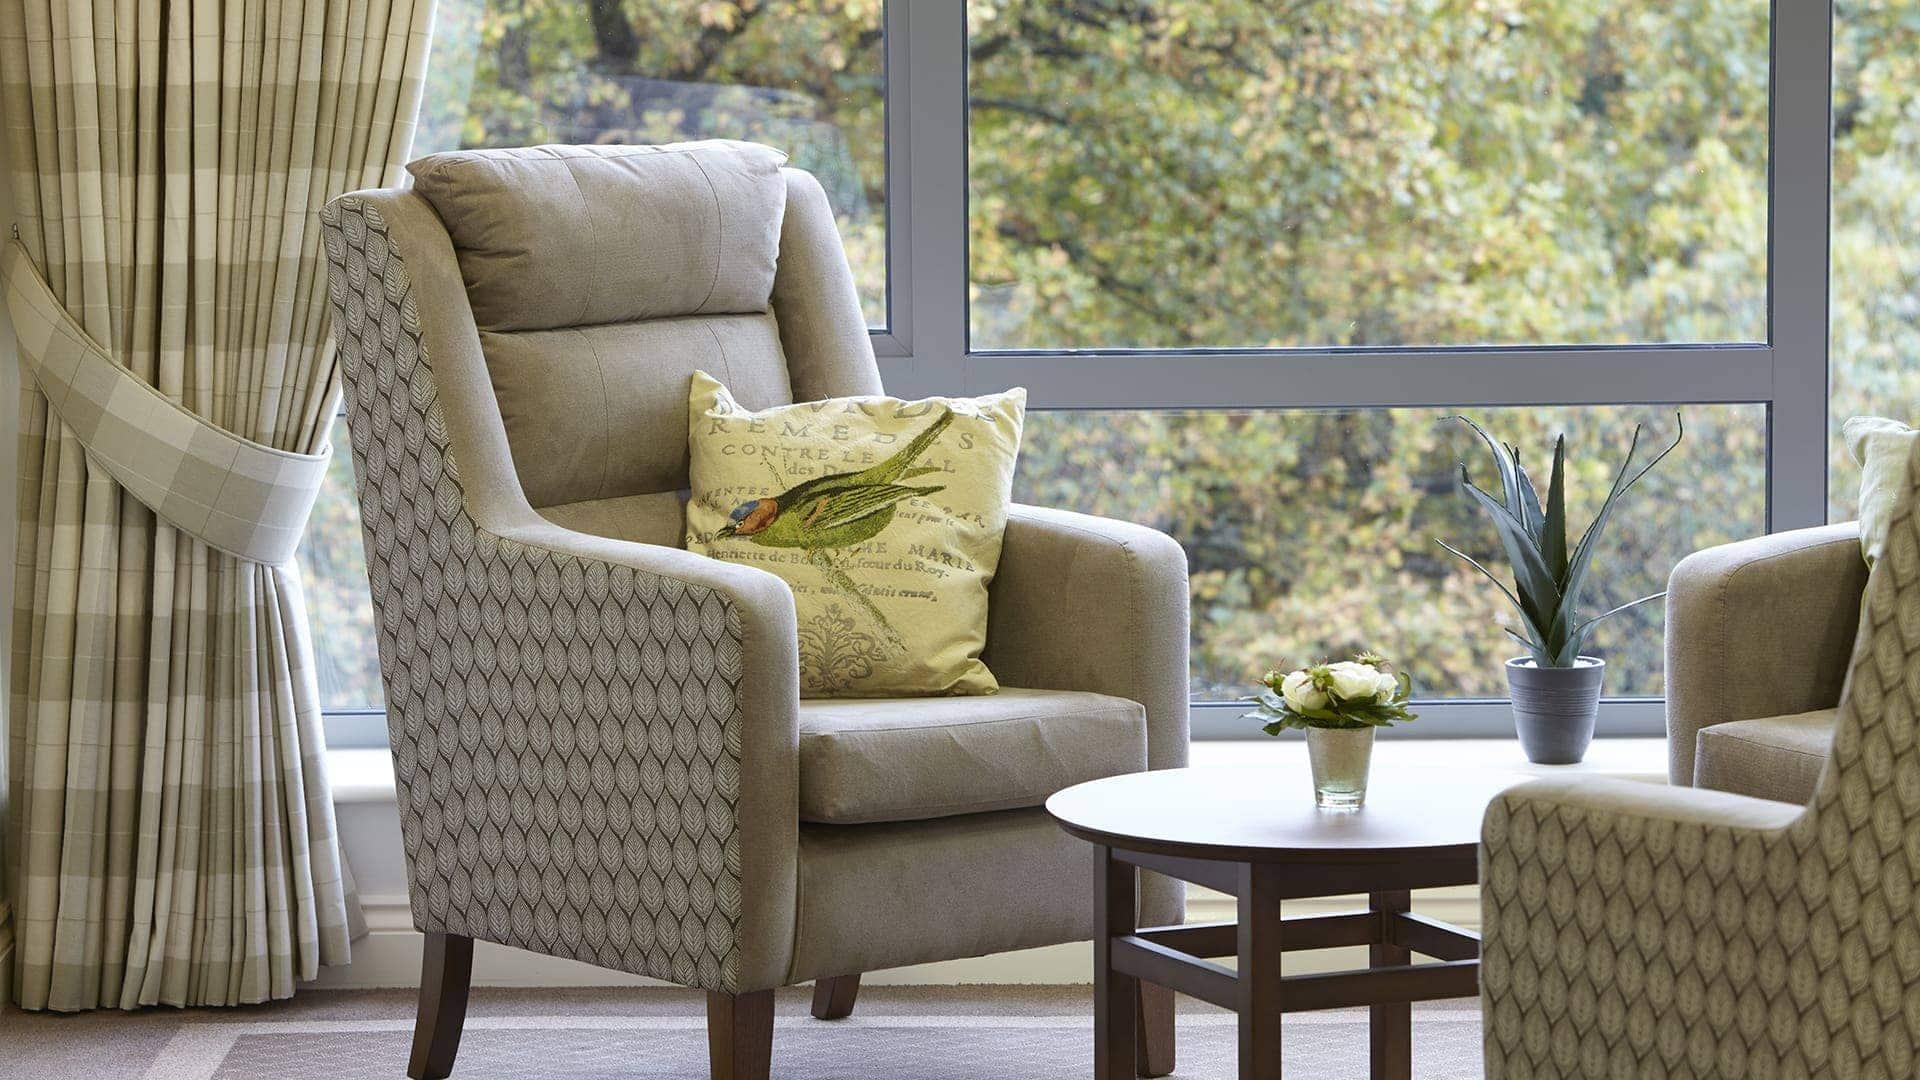 fire retardant cushion in care home